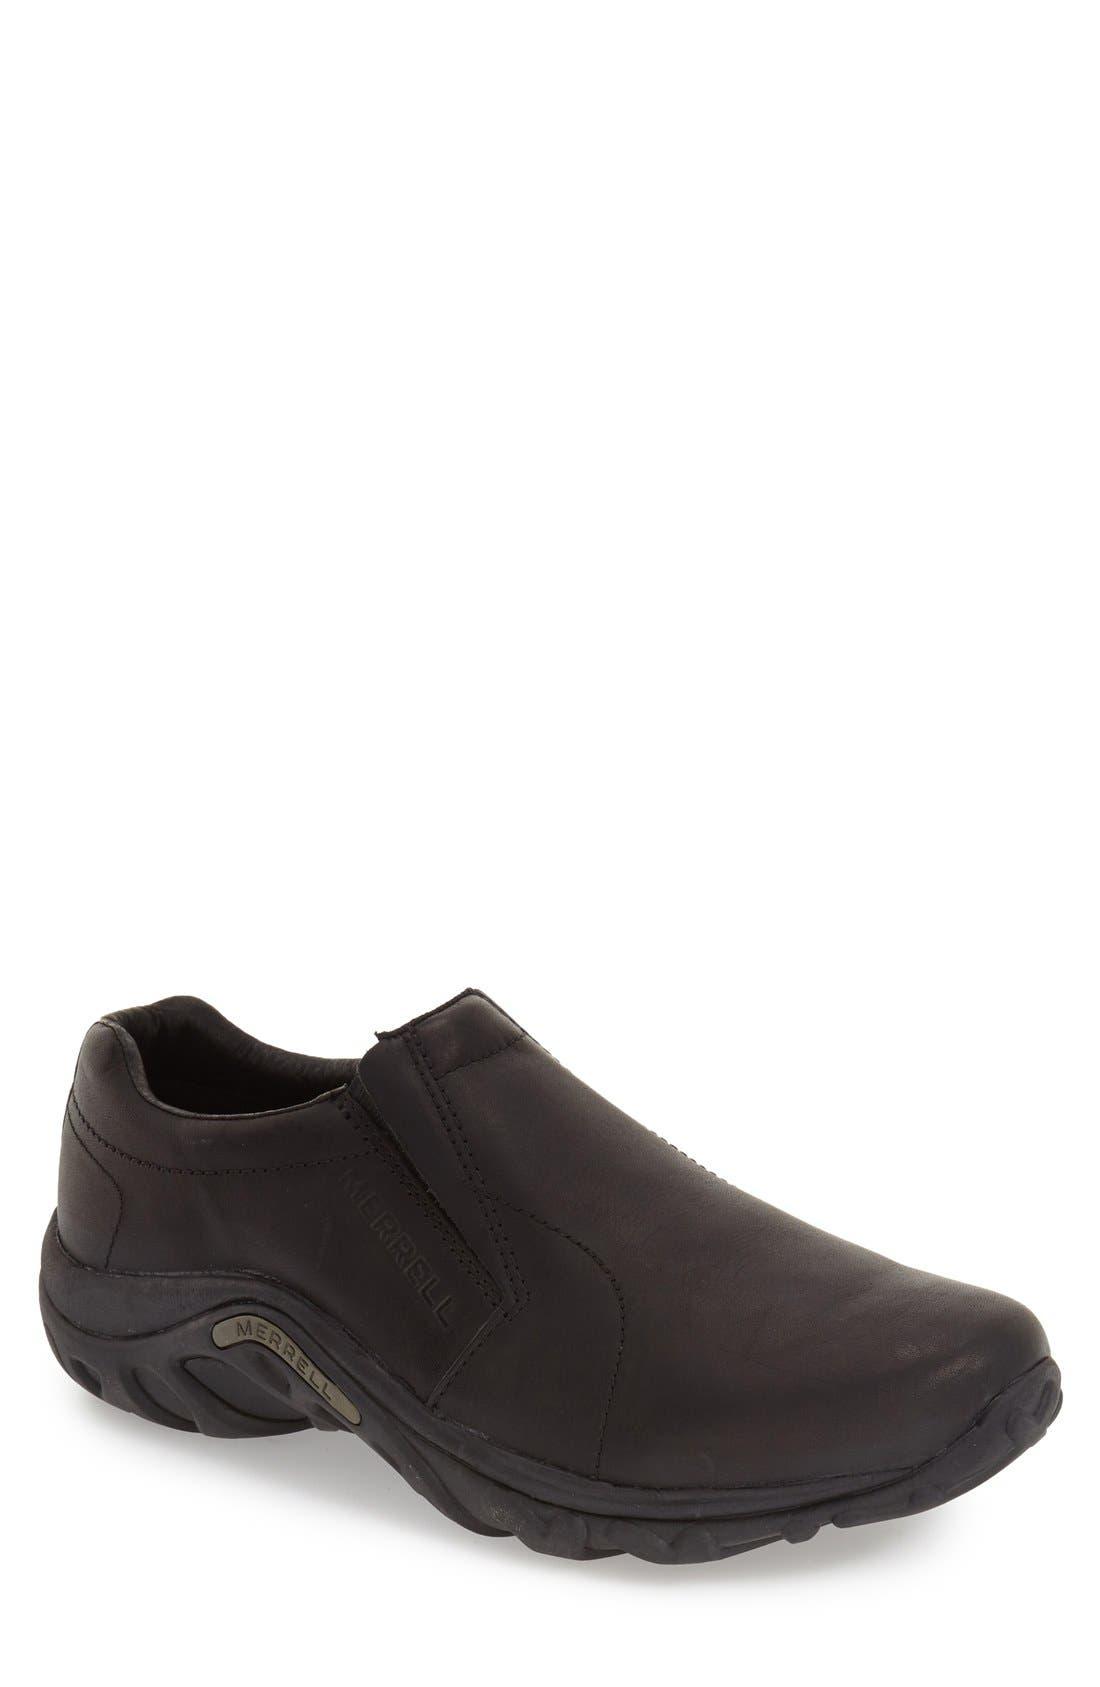 MERRELL, 'Jungle Moc' Leather Athletic Slip-On, Main thumbnail 1, color, BLACK